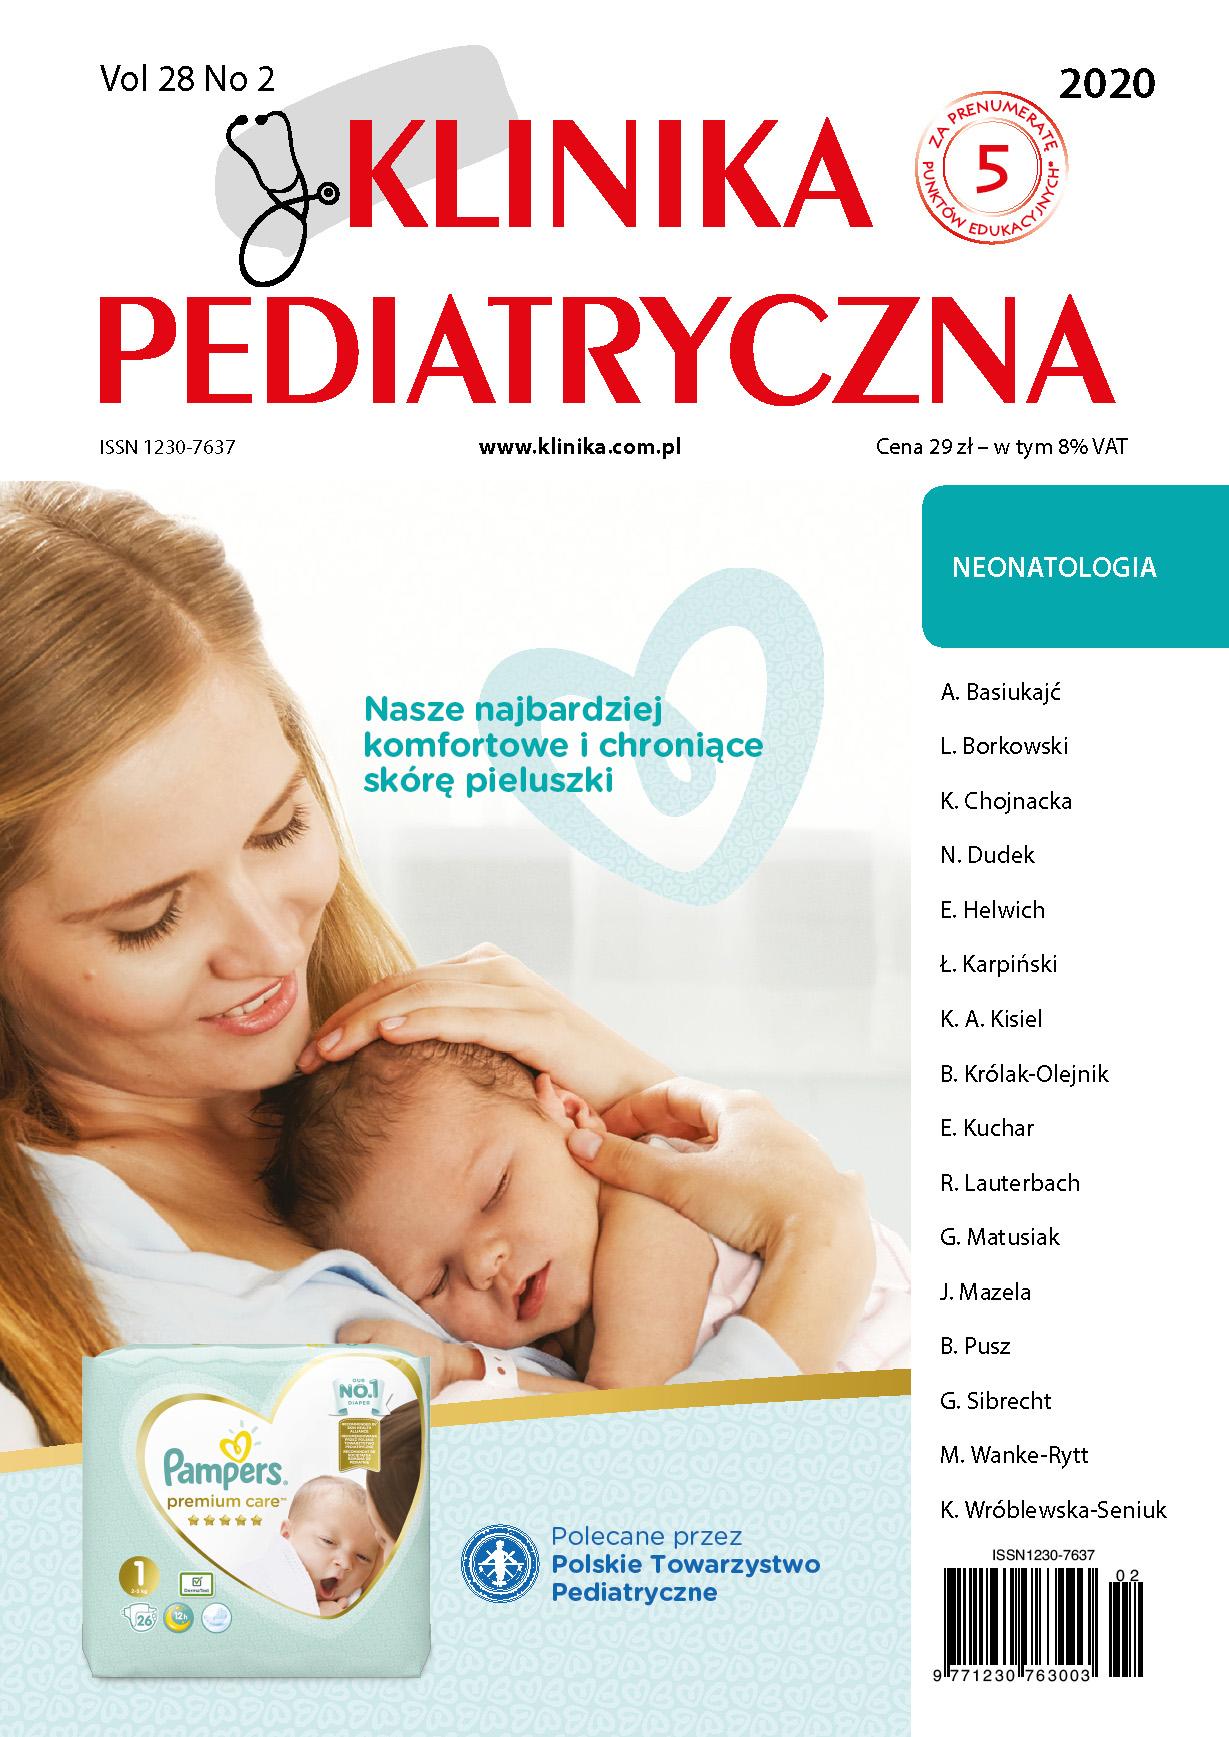 KP2/2020 Neonatologia